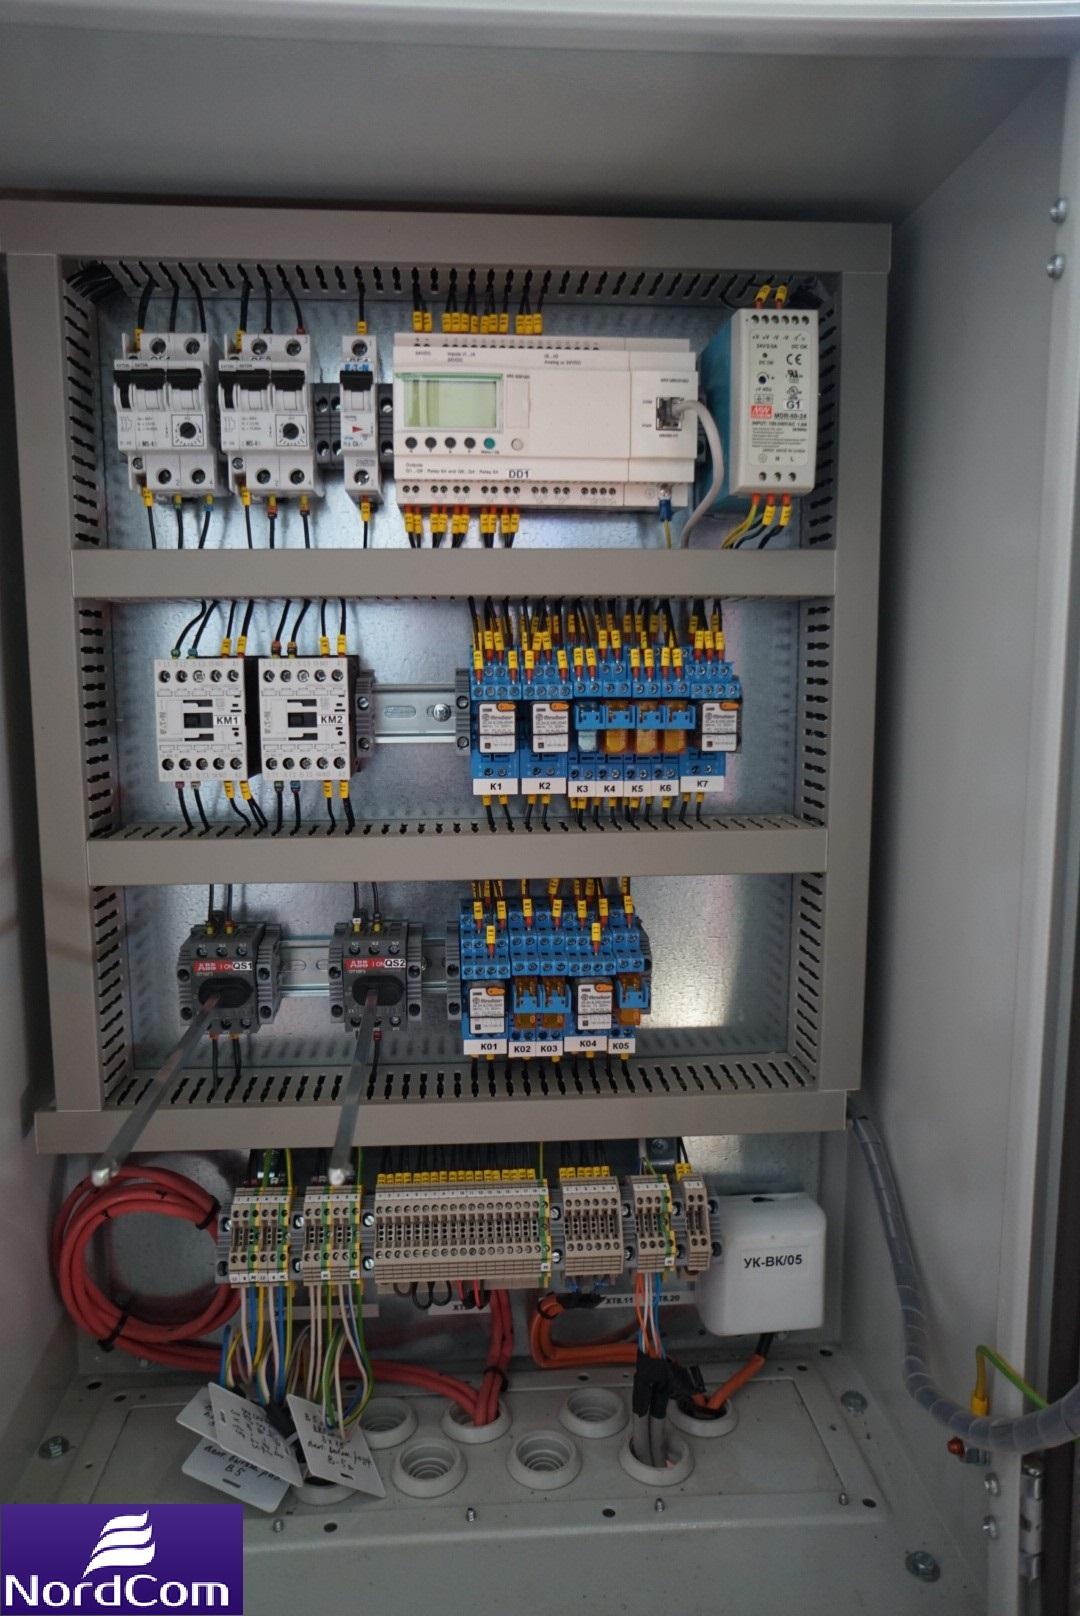 nordcom-spb-test-33